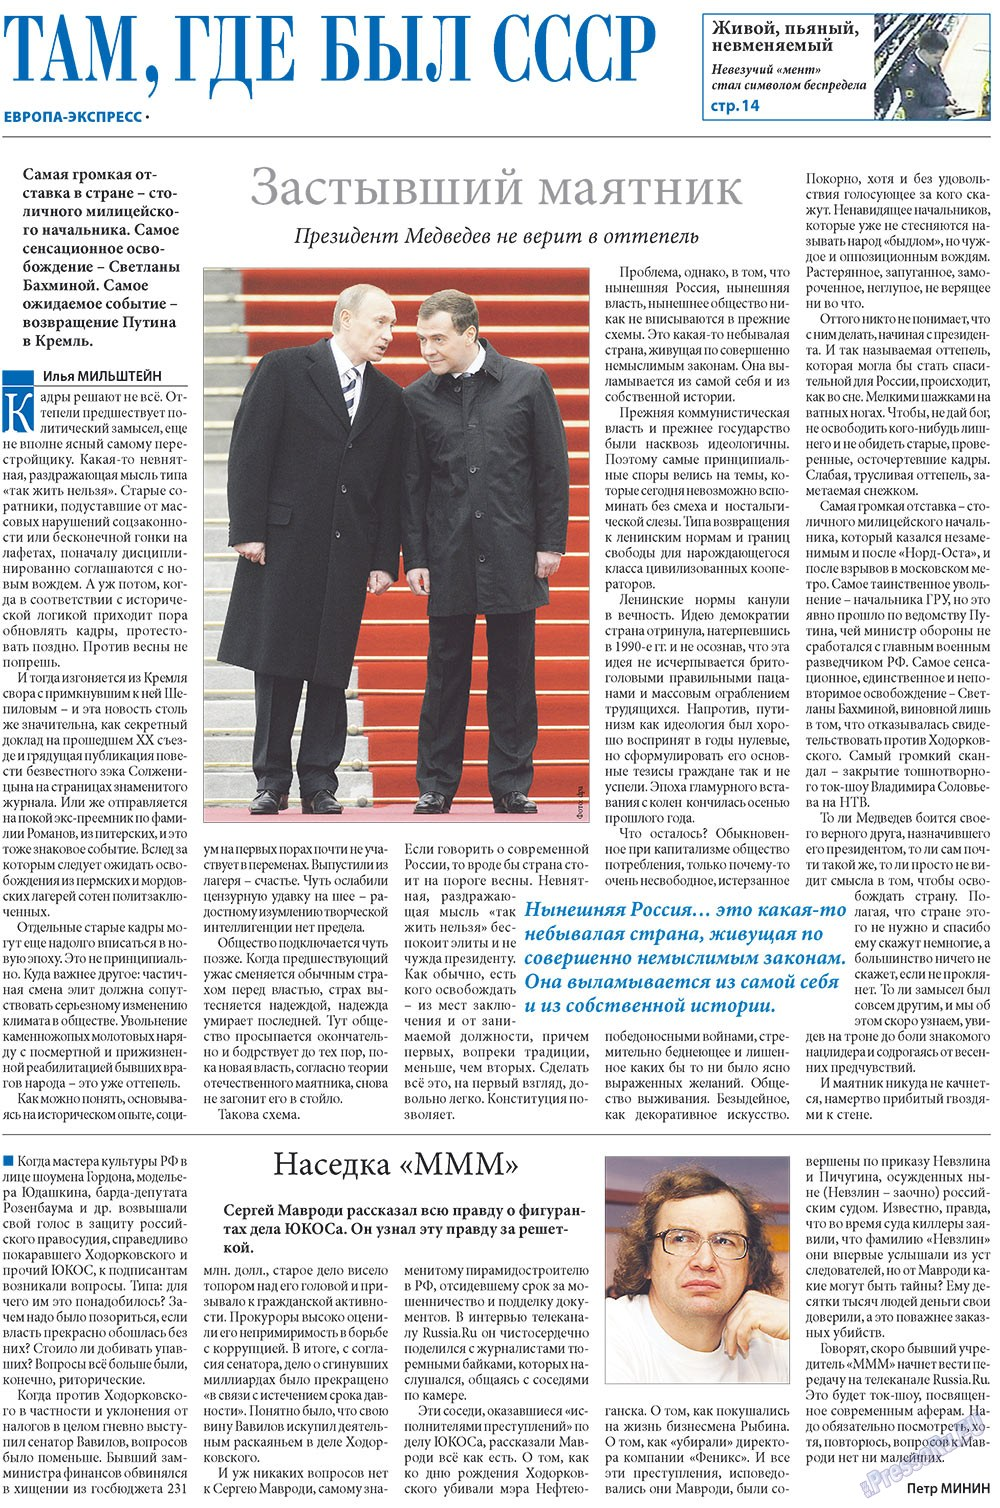 Европа экспресс (газета). 2009 год, номер 19, стр. 11